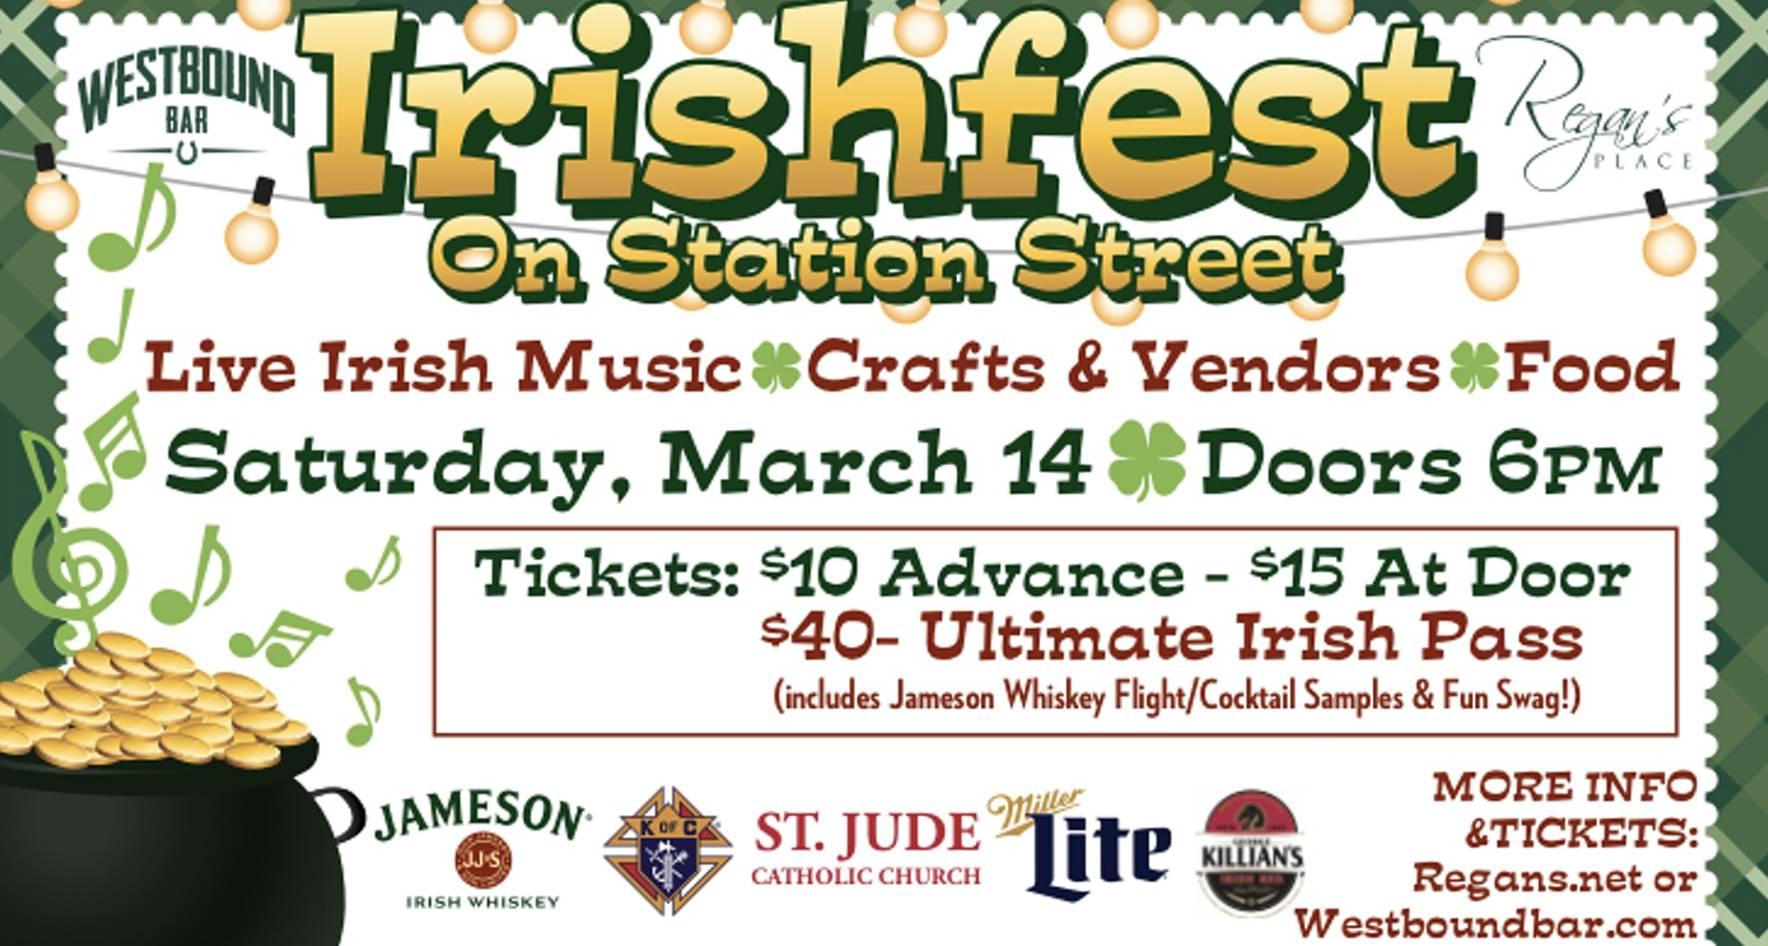 Irishfest on Station Street